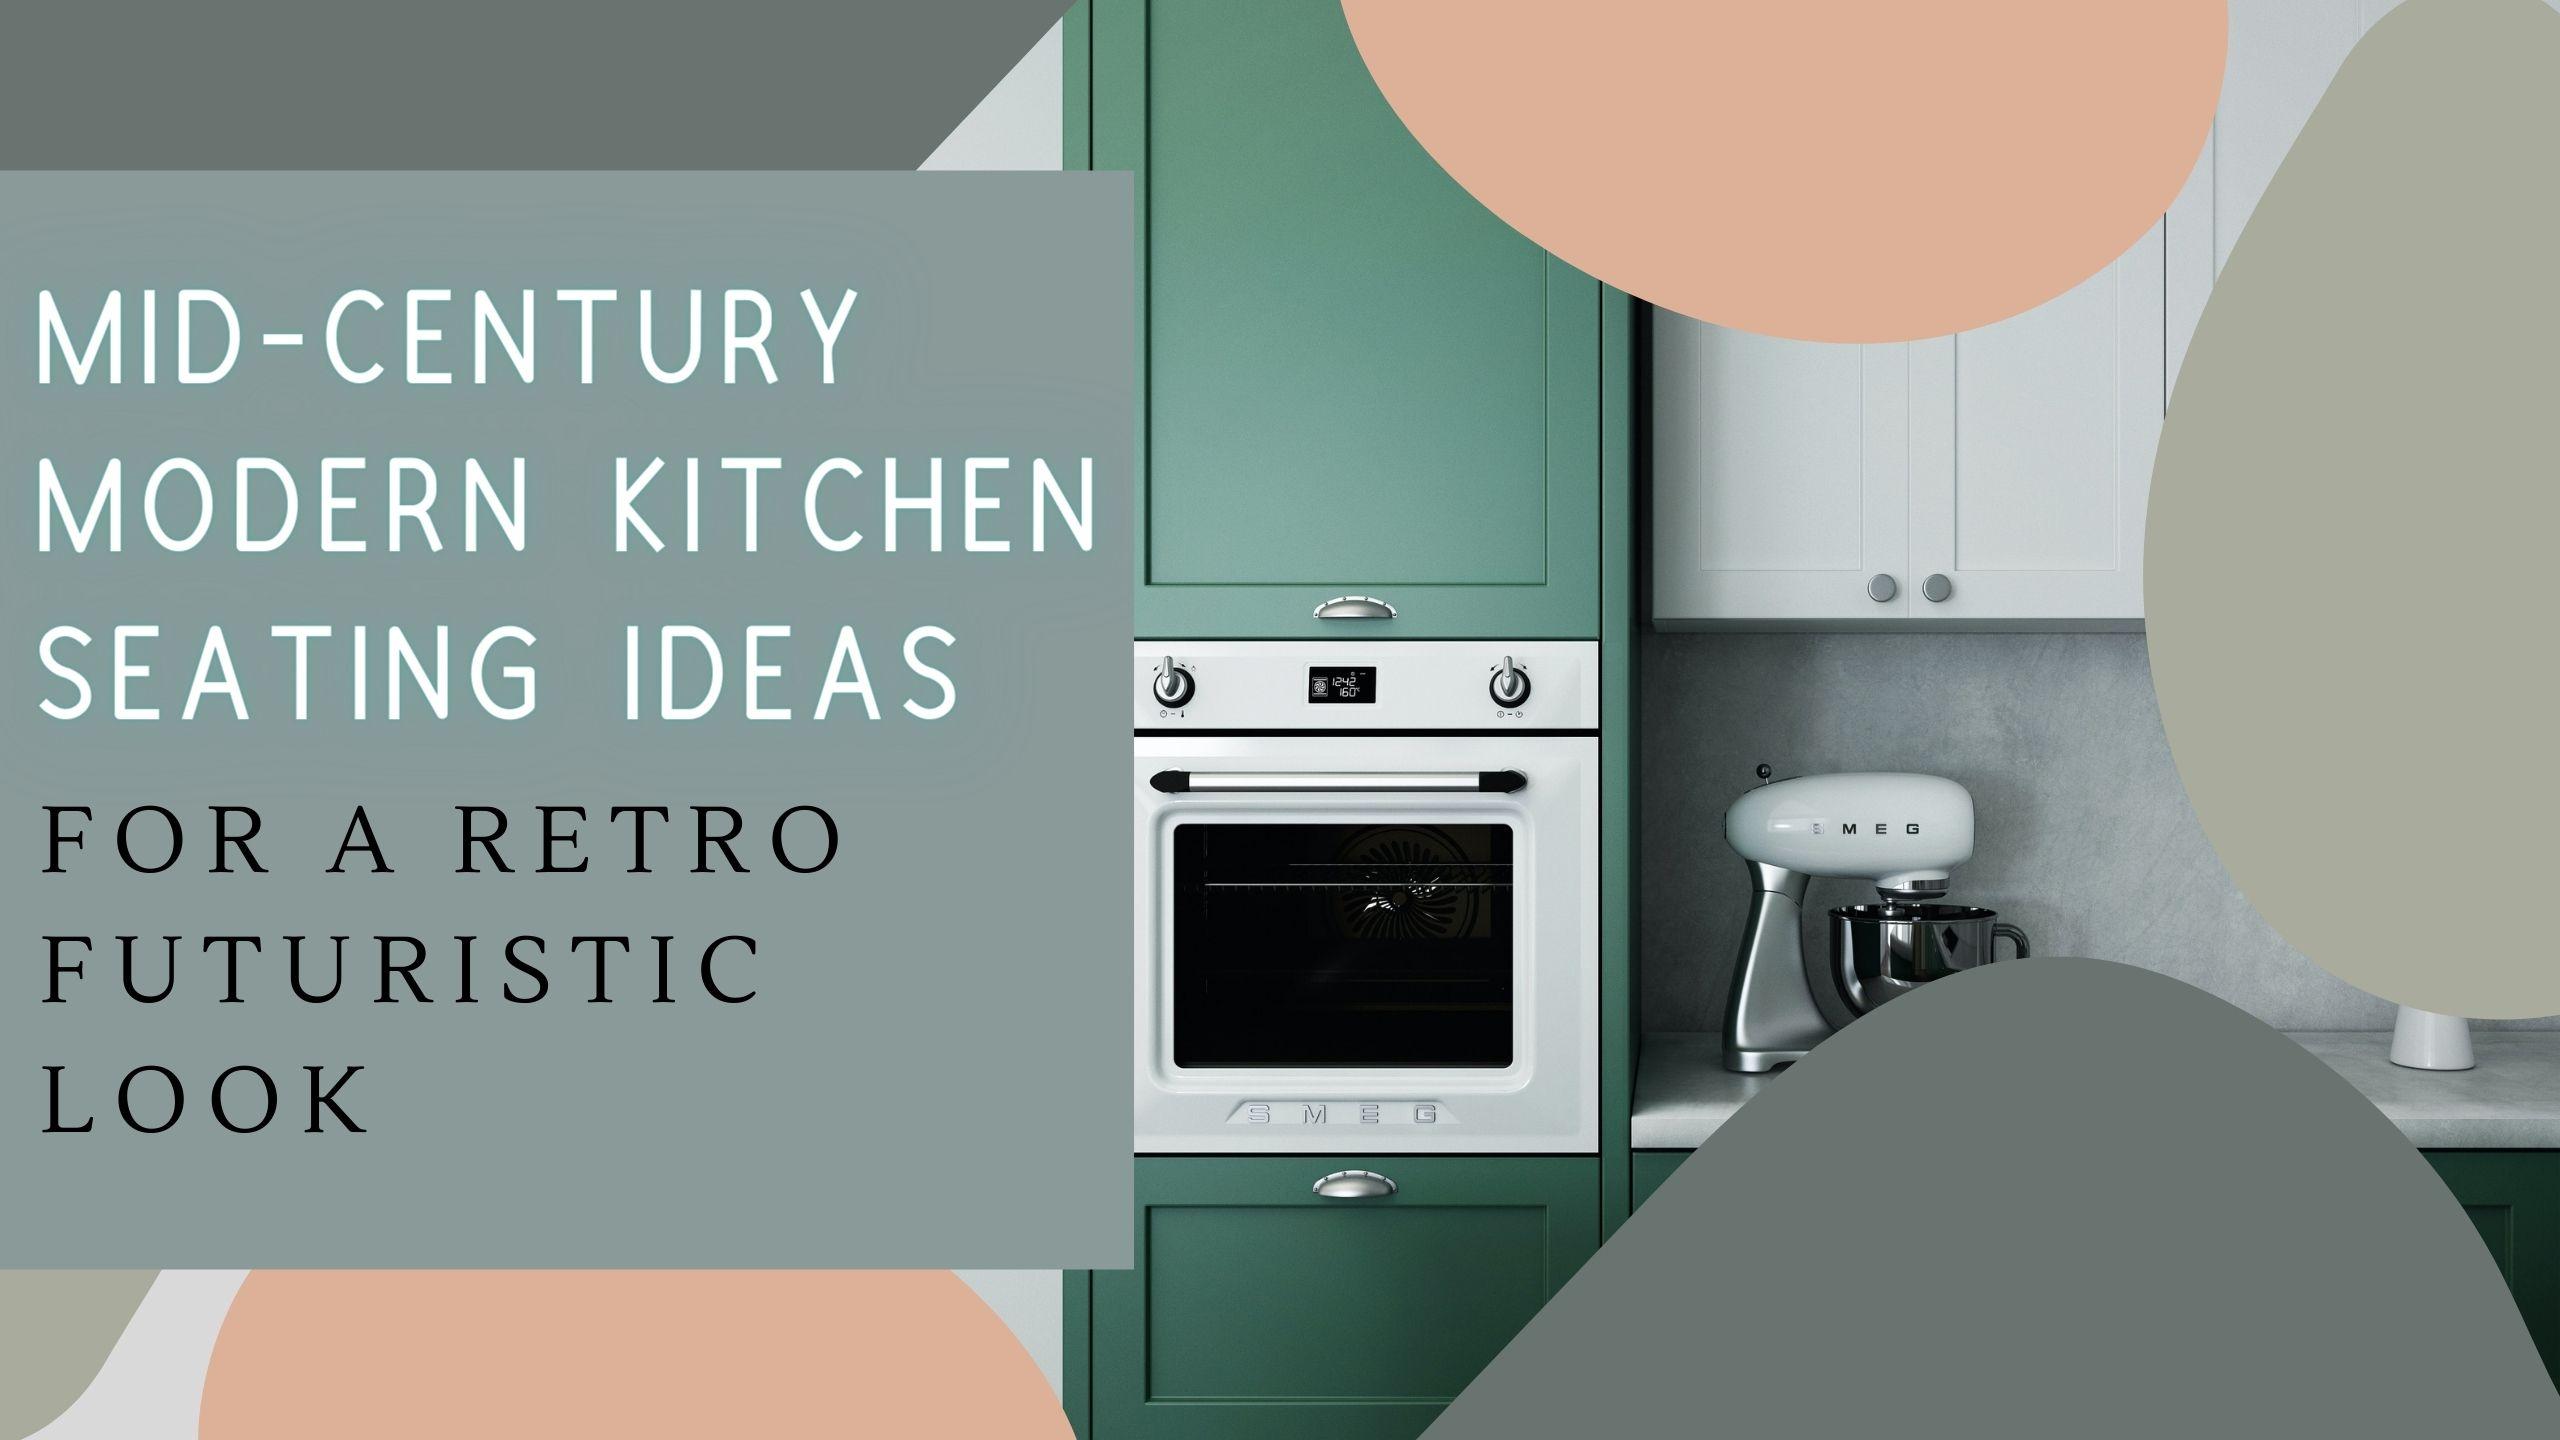 Mid-Century Modern Kitchen Seating Ideas Header